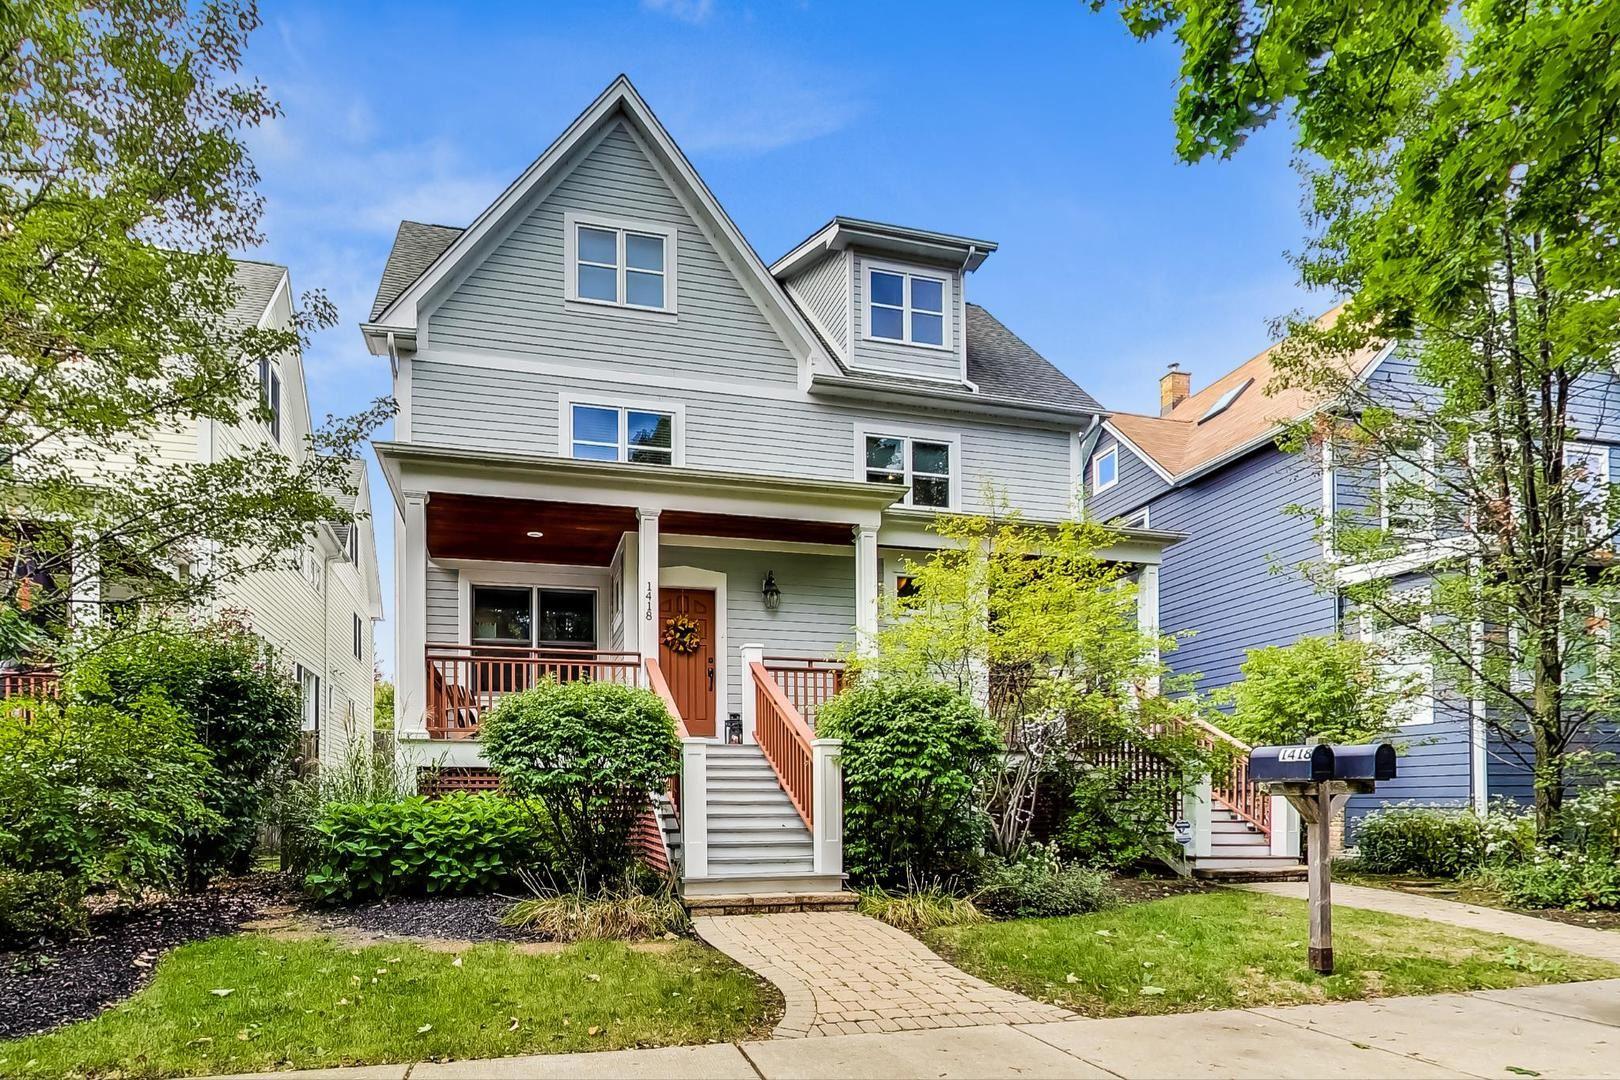 Photo for 1420 FLORENCE Avenue, Evanston, IL 60201 (MLS # 10928216)